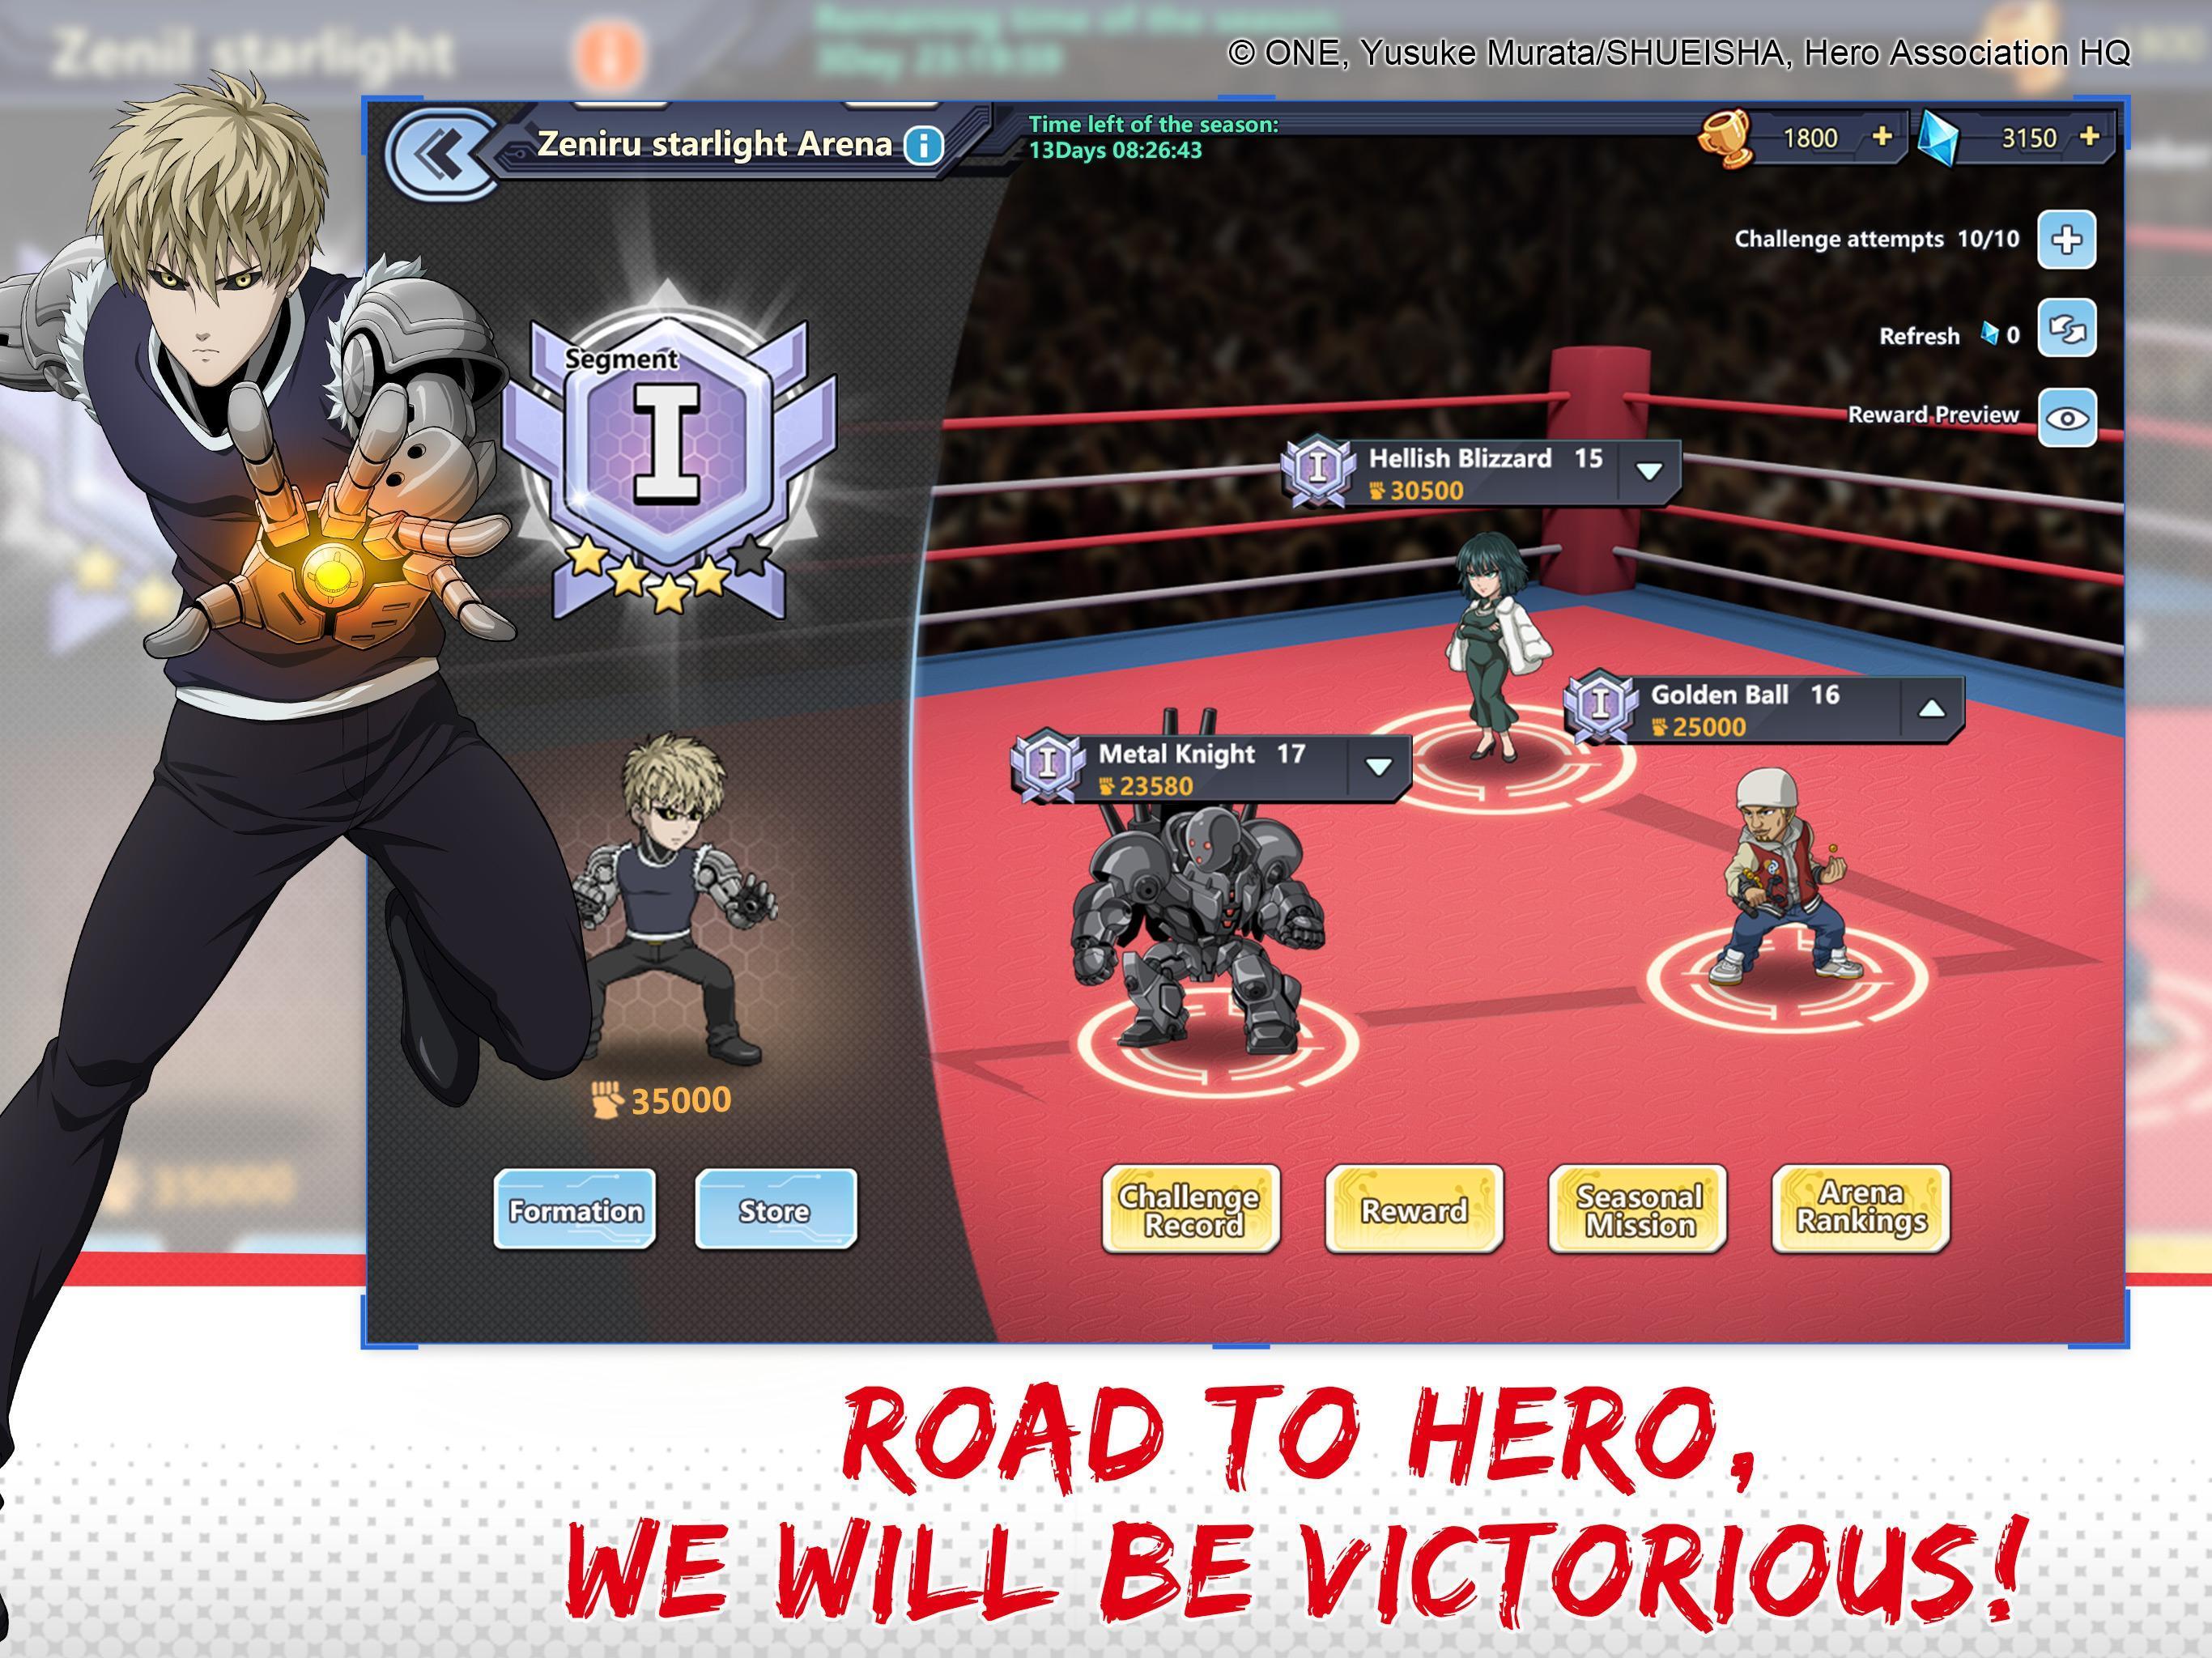 One-Punch Man: Road to Hero 1.8.0 Screenshot 4